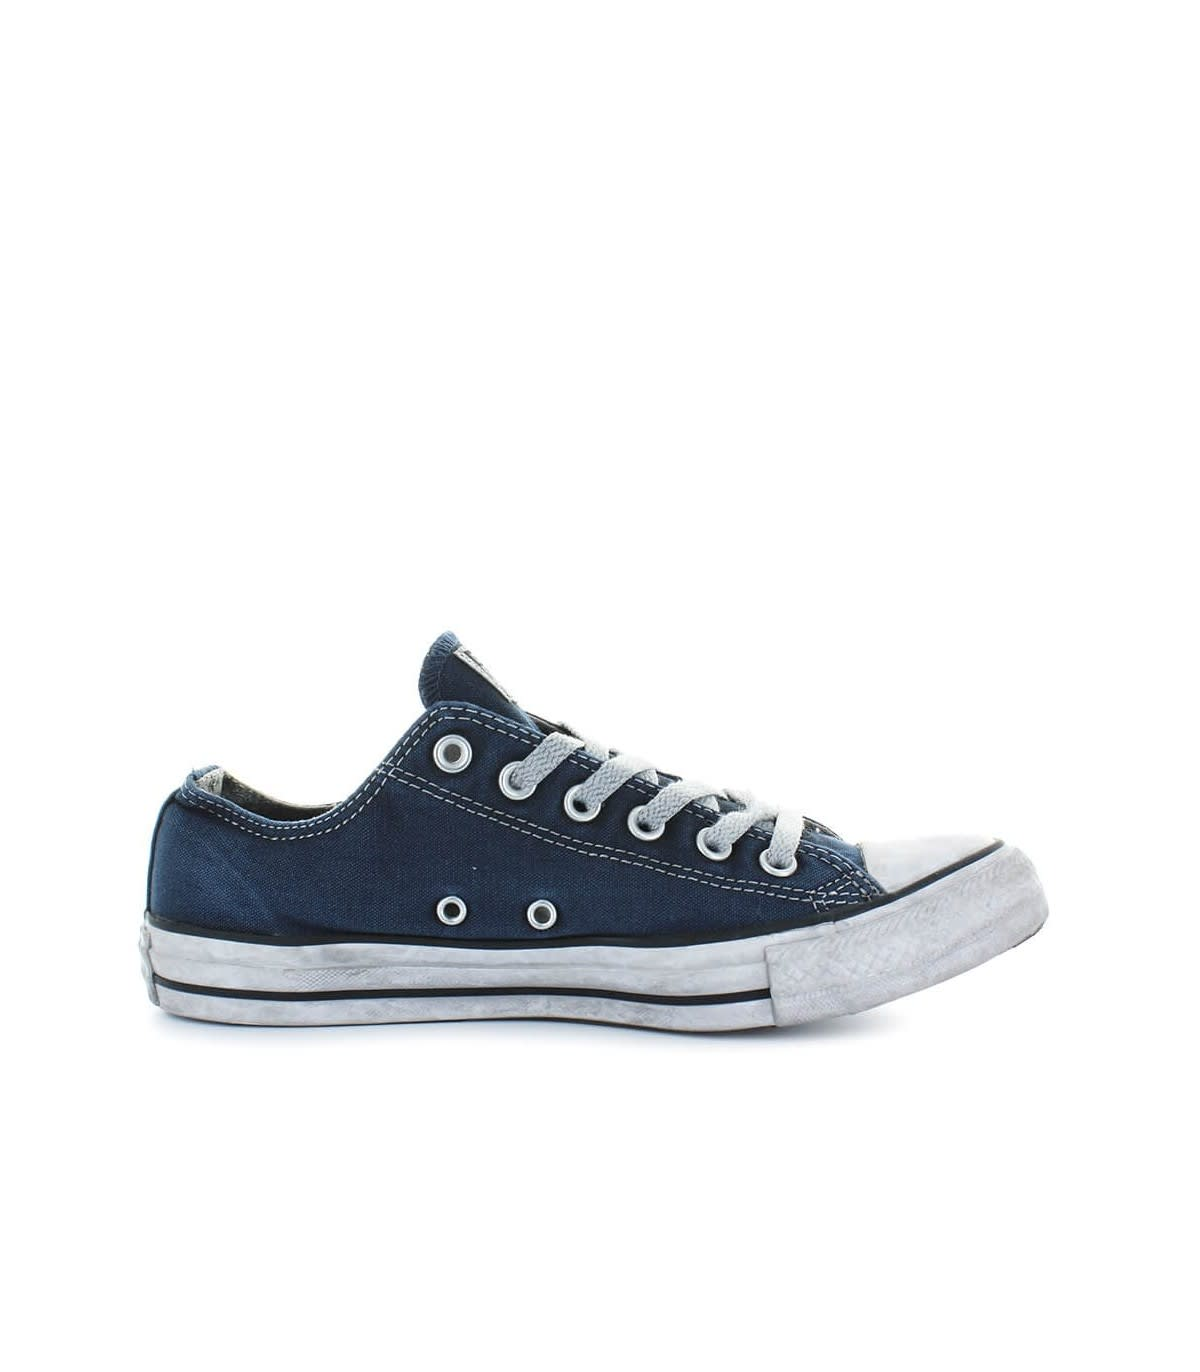 converse all star blue navy chuck taylor